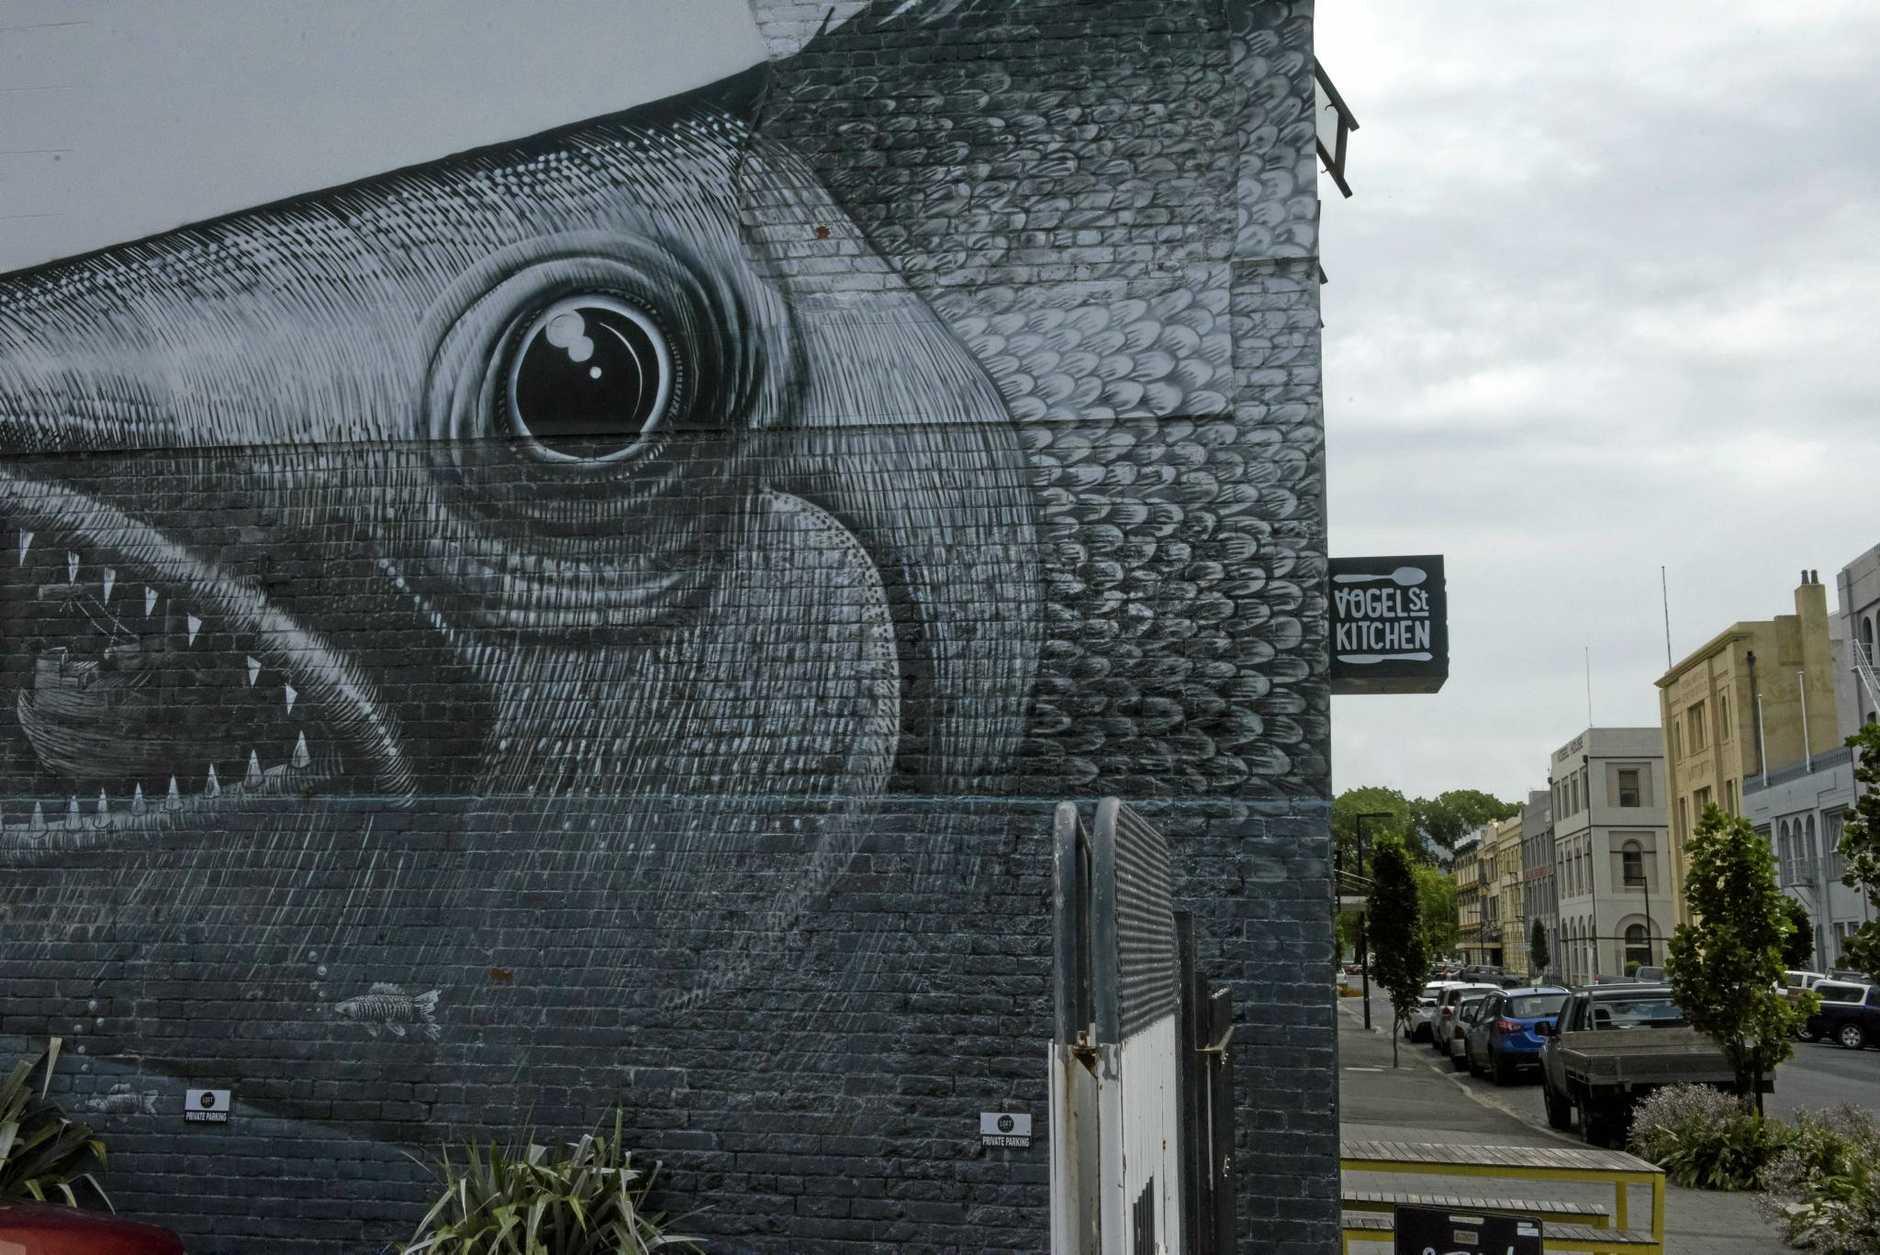 Street art is around every corner as part of the Dunedin CBD art walks.